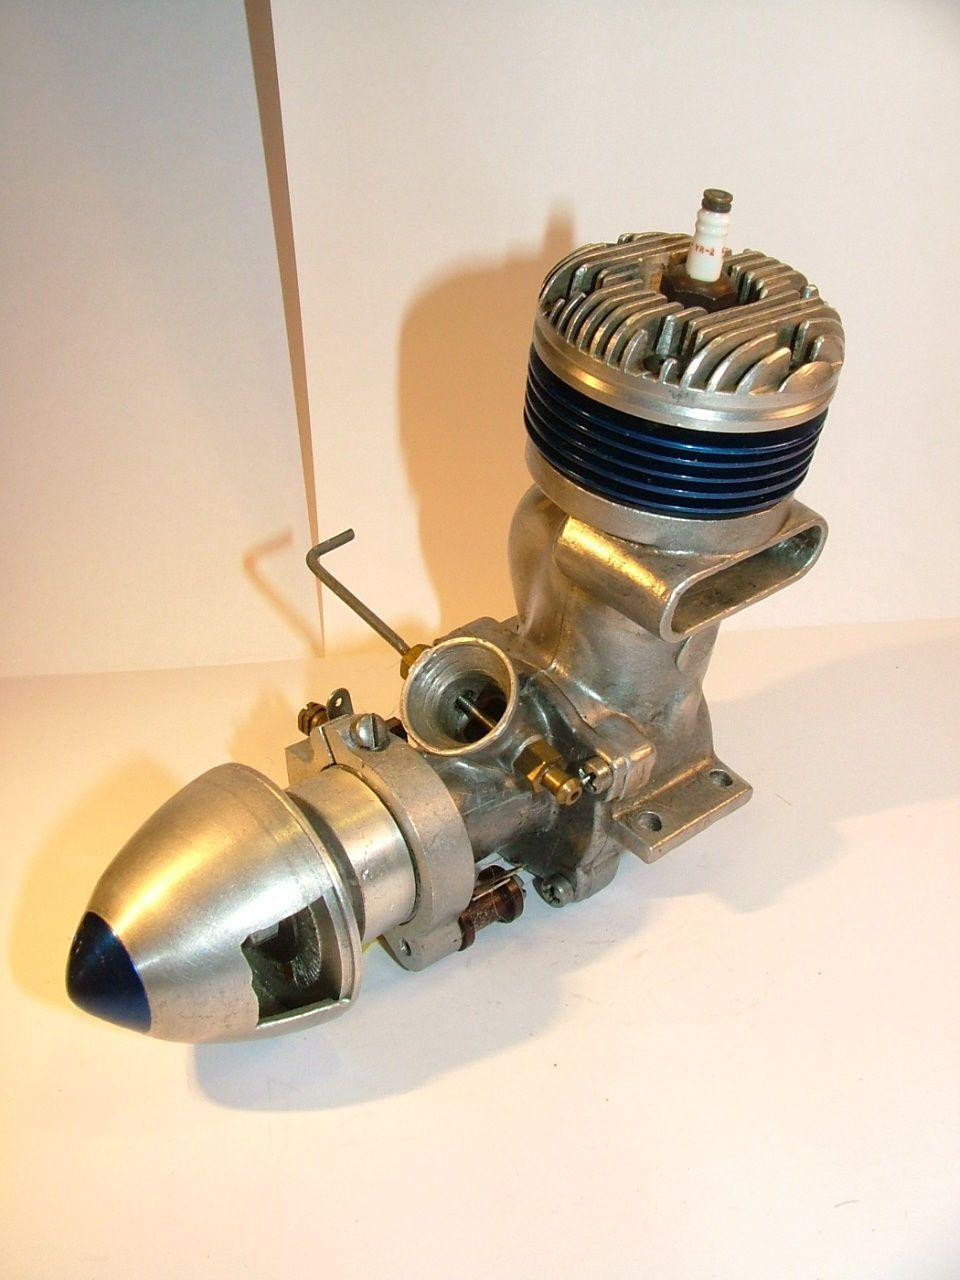 Hassad Bluestreak Vintage Ignition Model Aircraft Engine Fai Da Te Foto